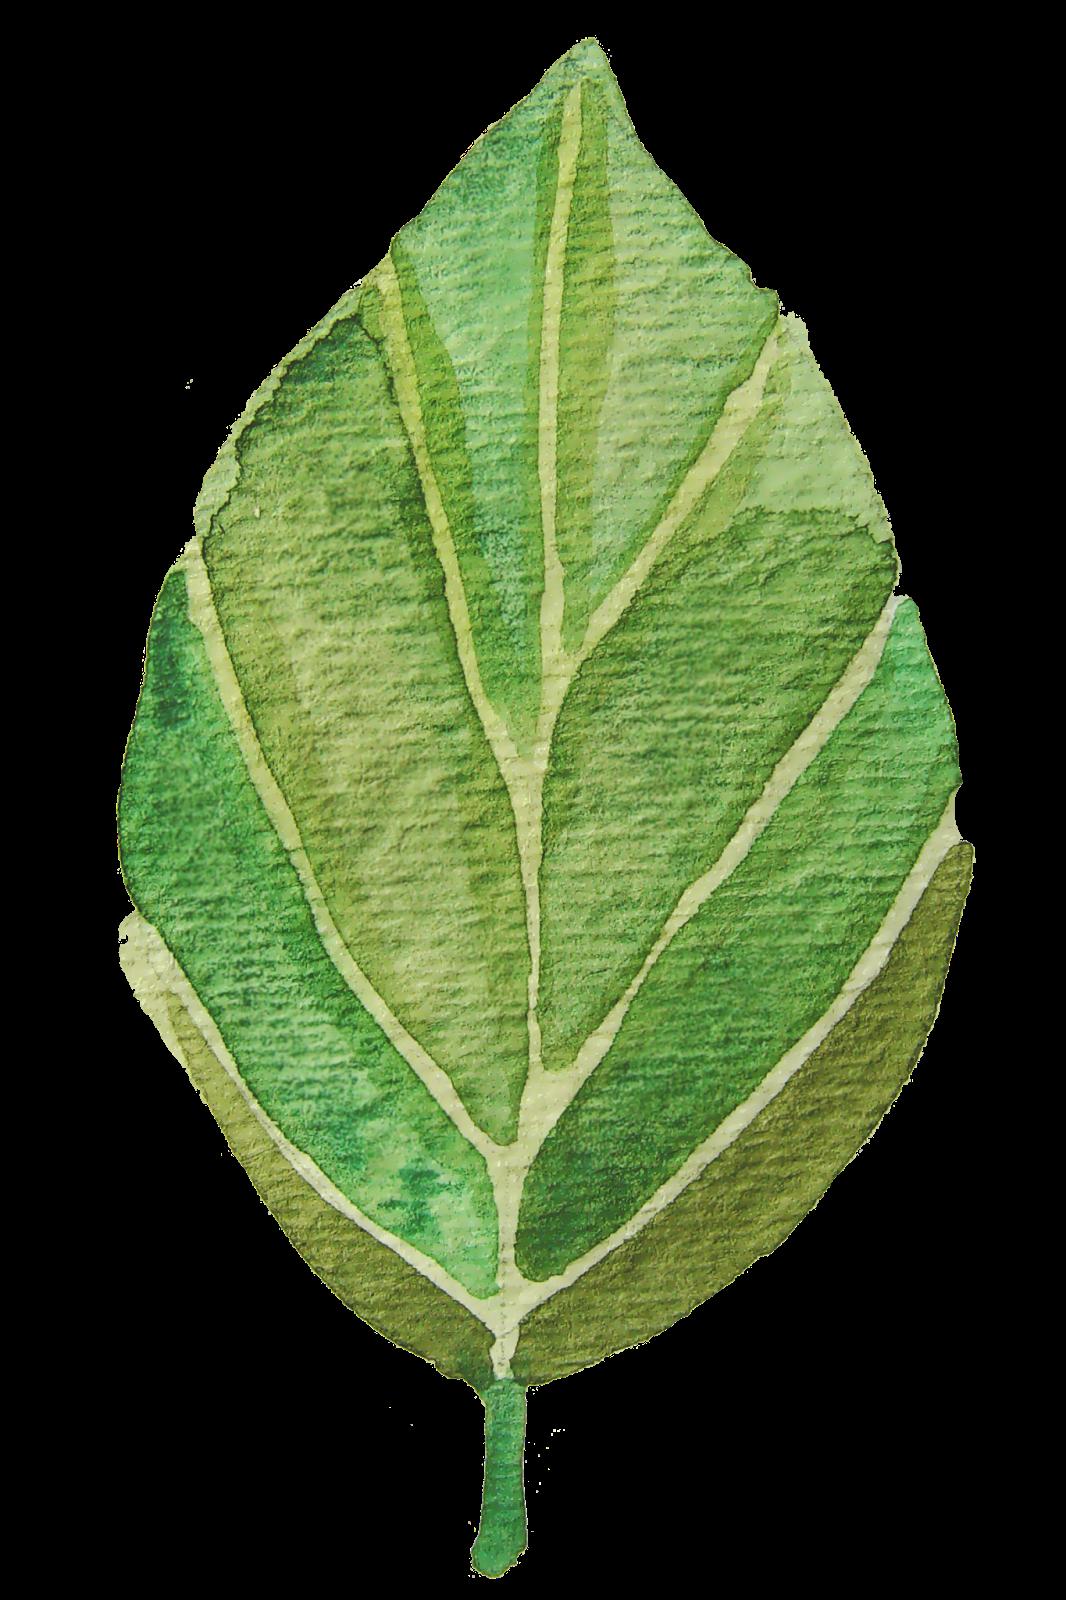 Leaf clipart plain. Green scrapbook pesquisa google